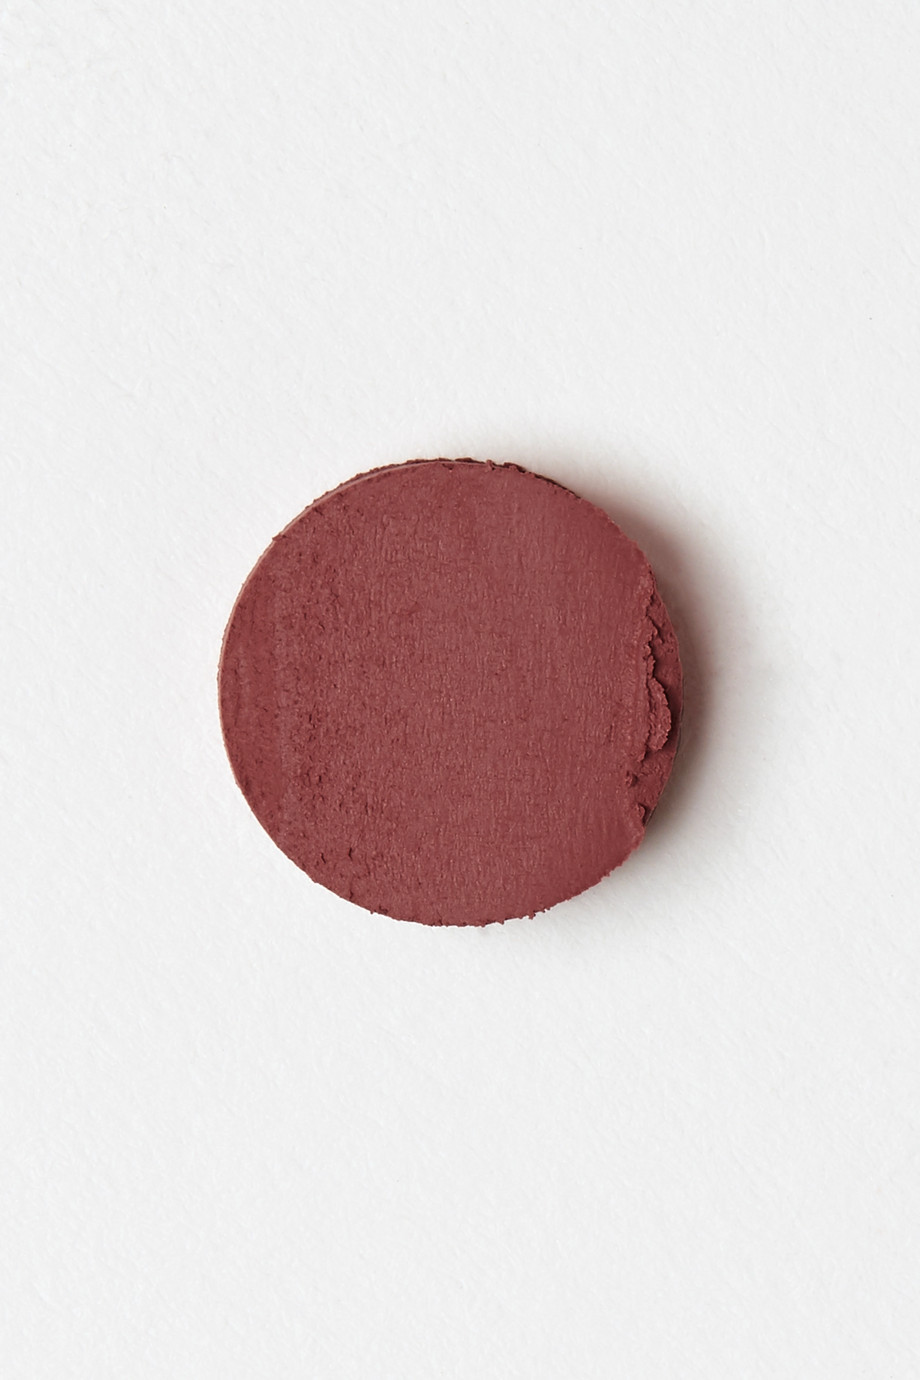 Gucci Beauty Rouge à Lèvres Mat Lipstick - Louisa Red 506